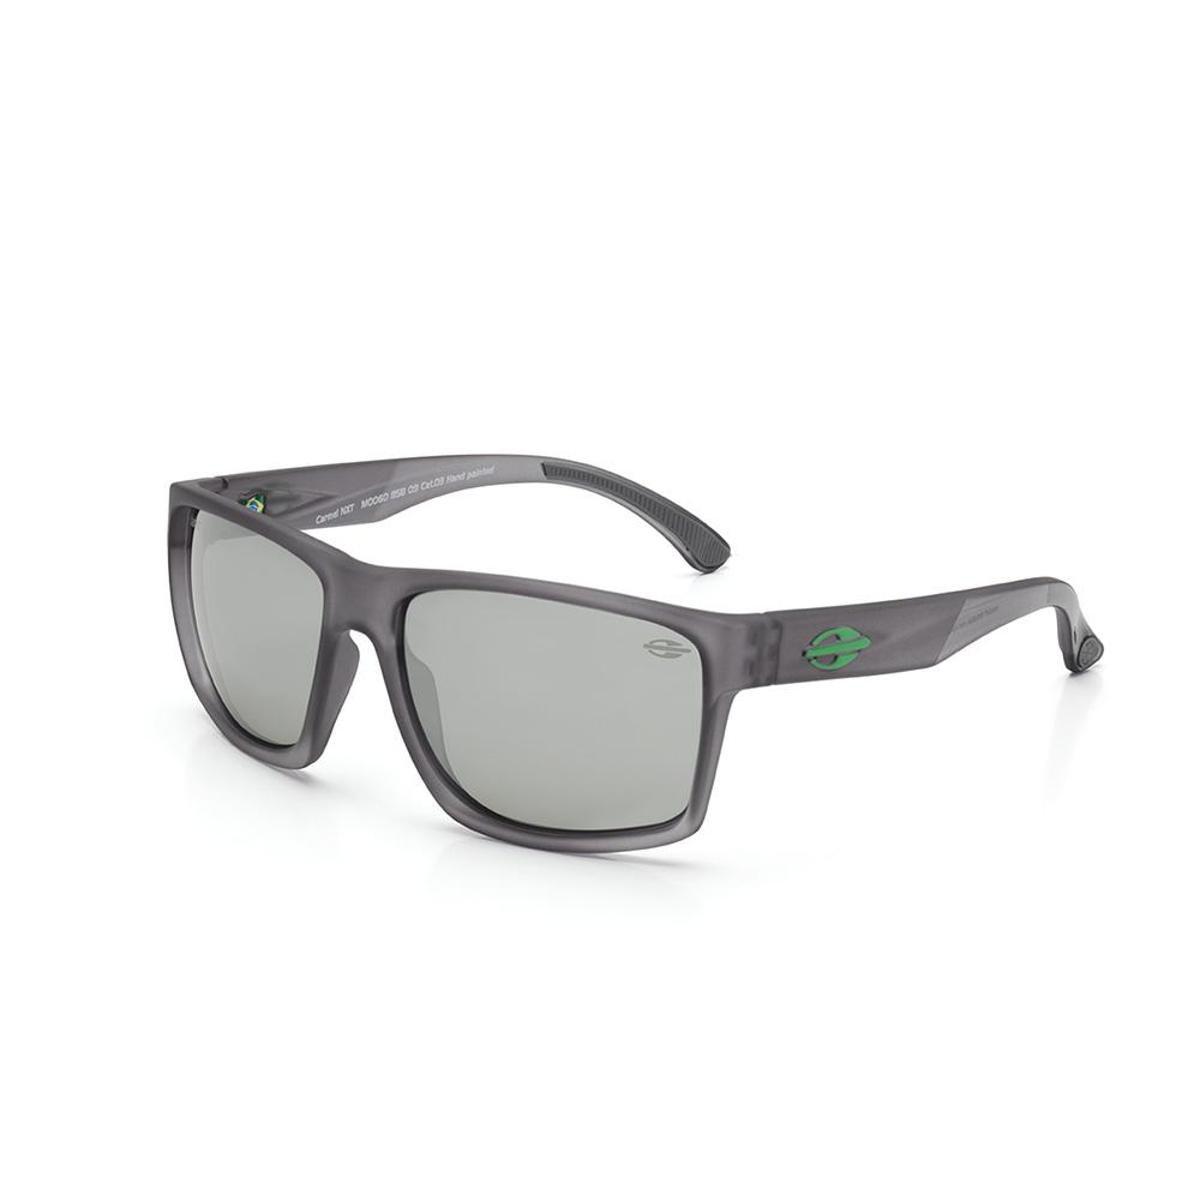 Óculos De Sol Mormaii Carmel Nxt Fume - Fumê - Compre Agora   Zattini 41a34b1284